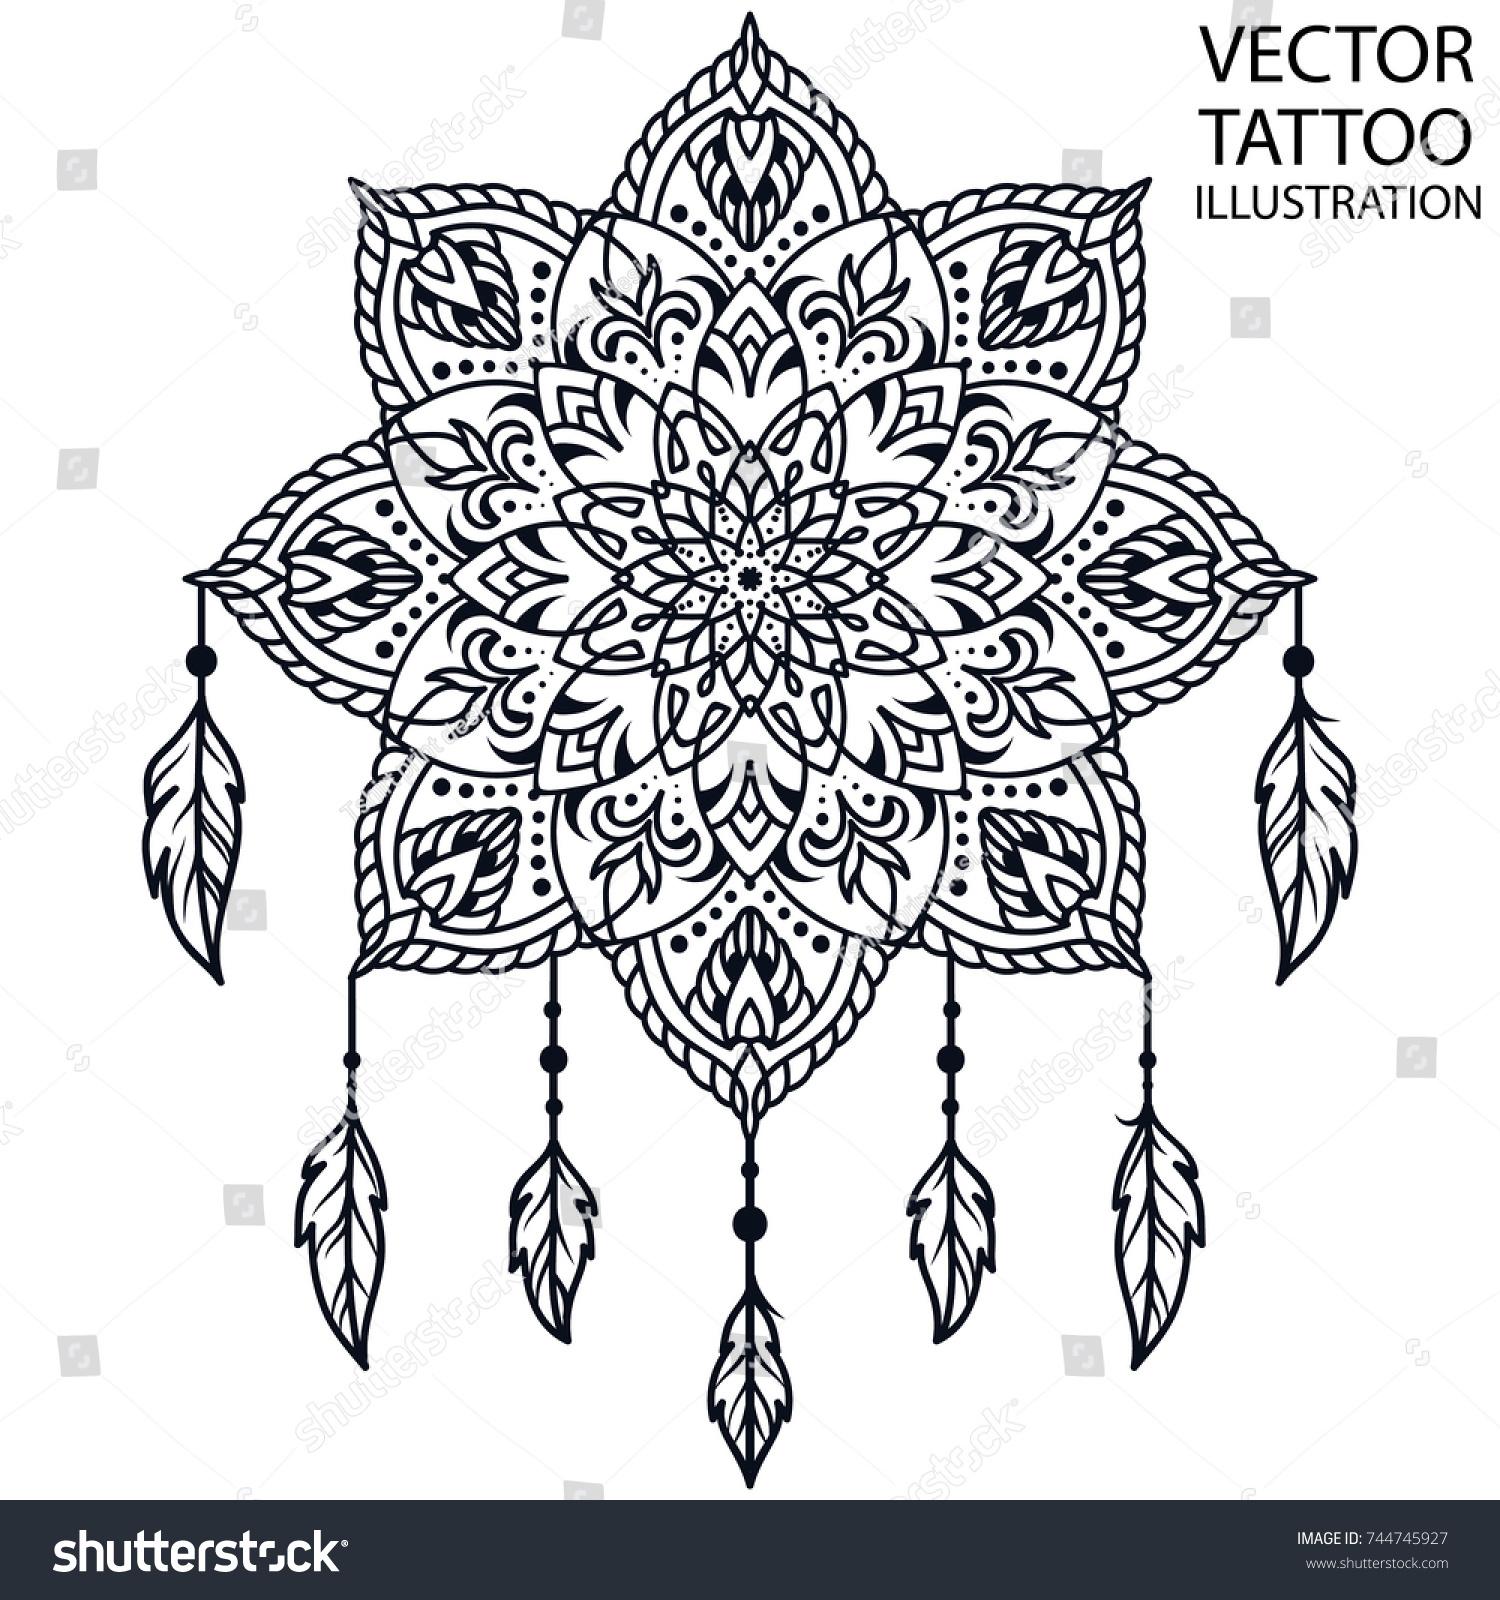 Dreamcatcher Tattoo For Shoulder Waist Blade Forearm Arm Chest